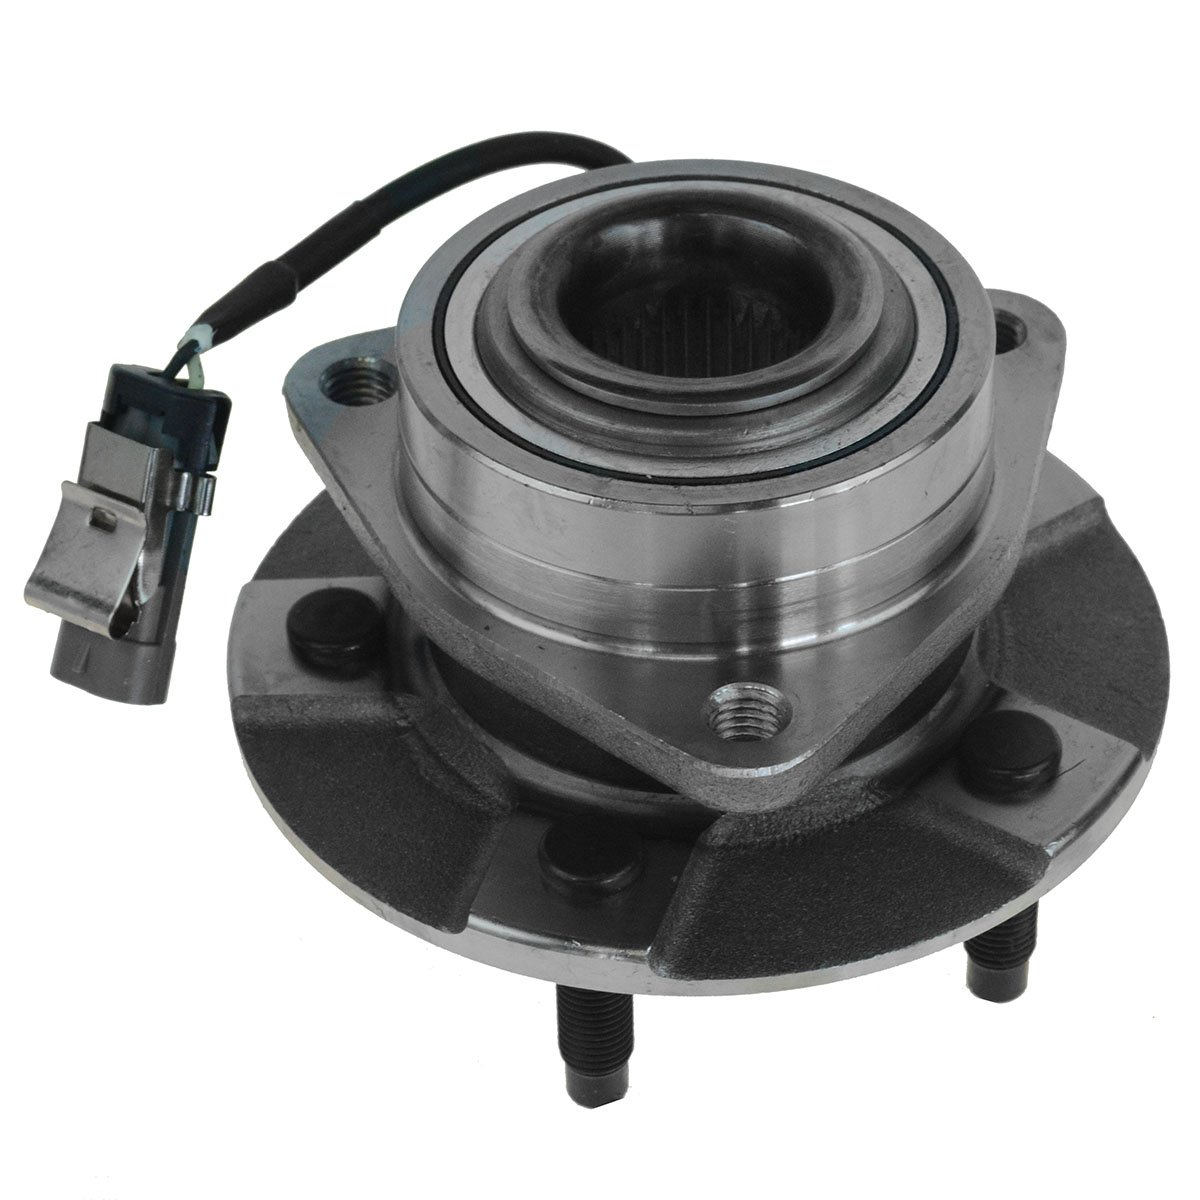 TRQ Front /& Rear Wheel Hub /& Bearing Assembly Kit for Equinox Torrent Vue